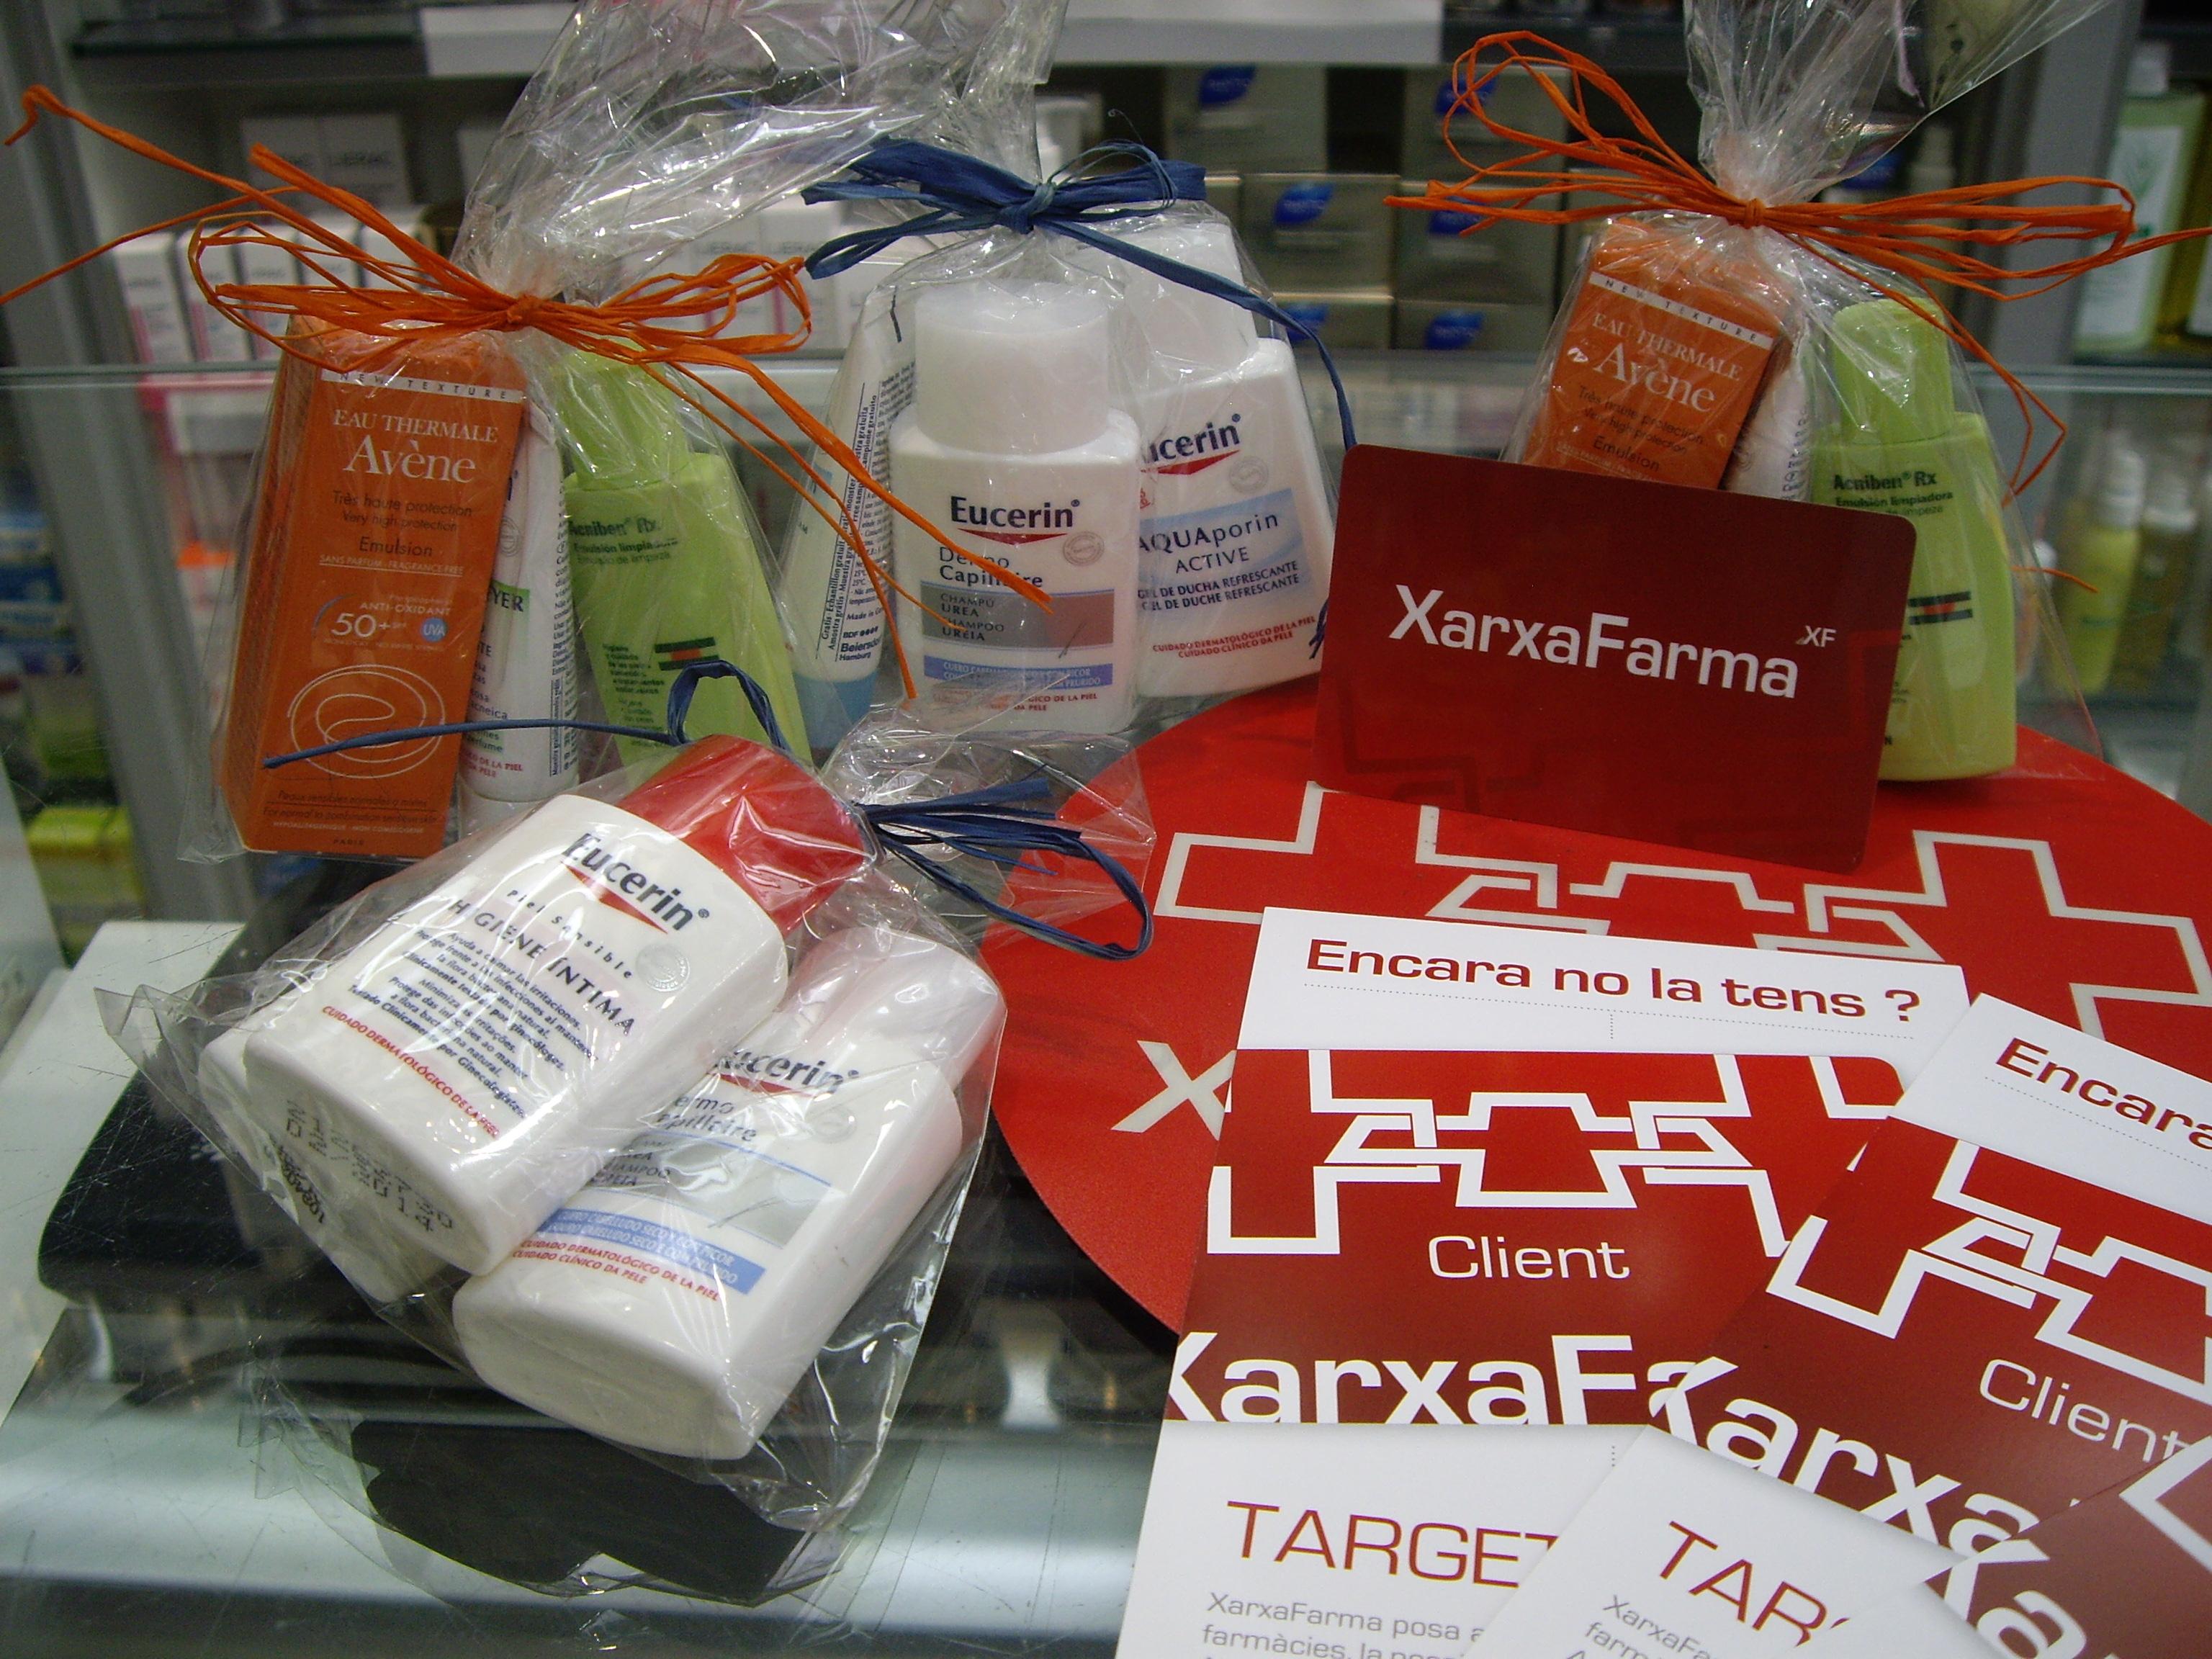 Targeta Client Xarxafarma Farmacia Torras Badalona